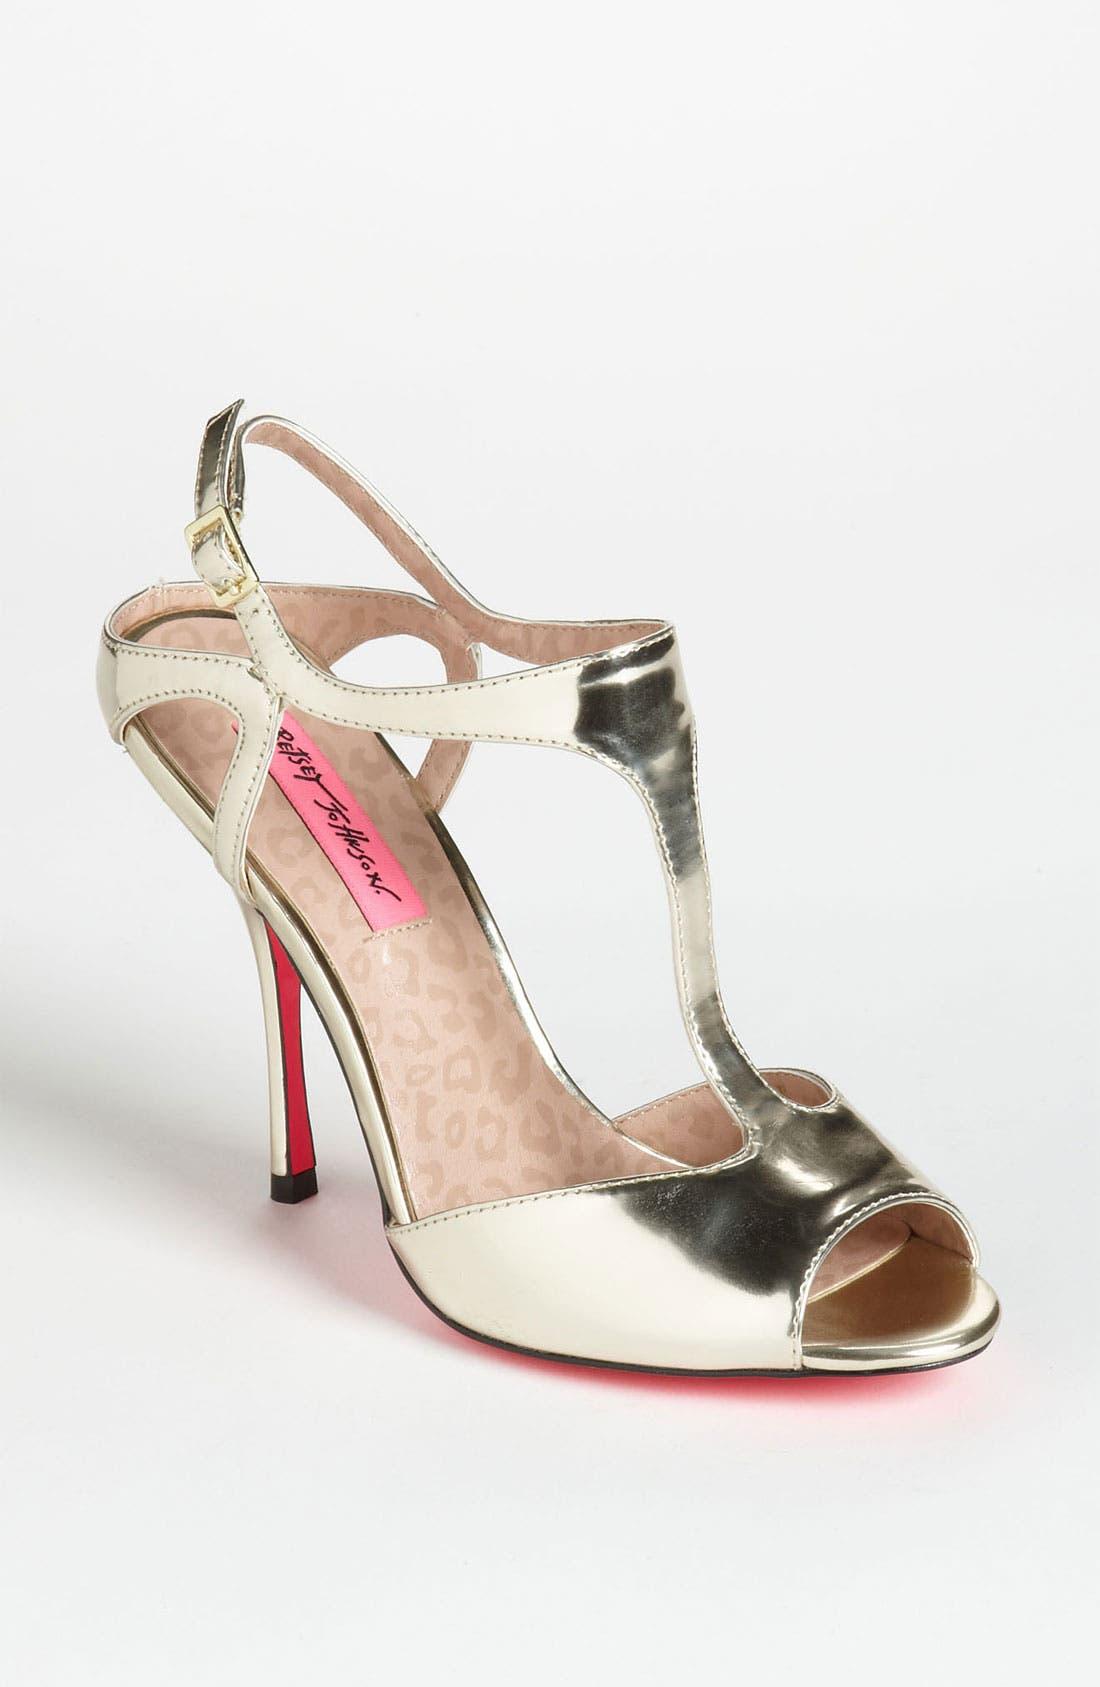 Main Image - Betsey Johnson 'Blonddee' Sandal